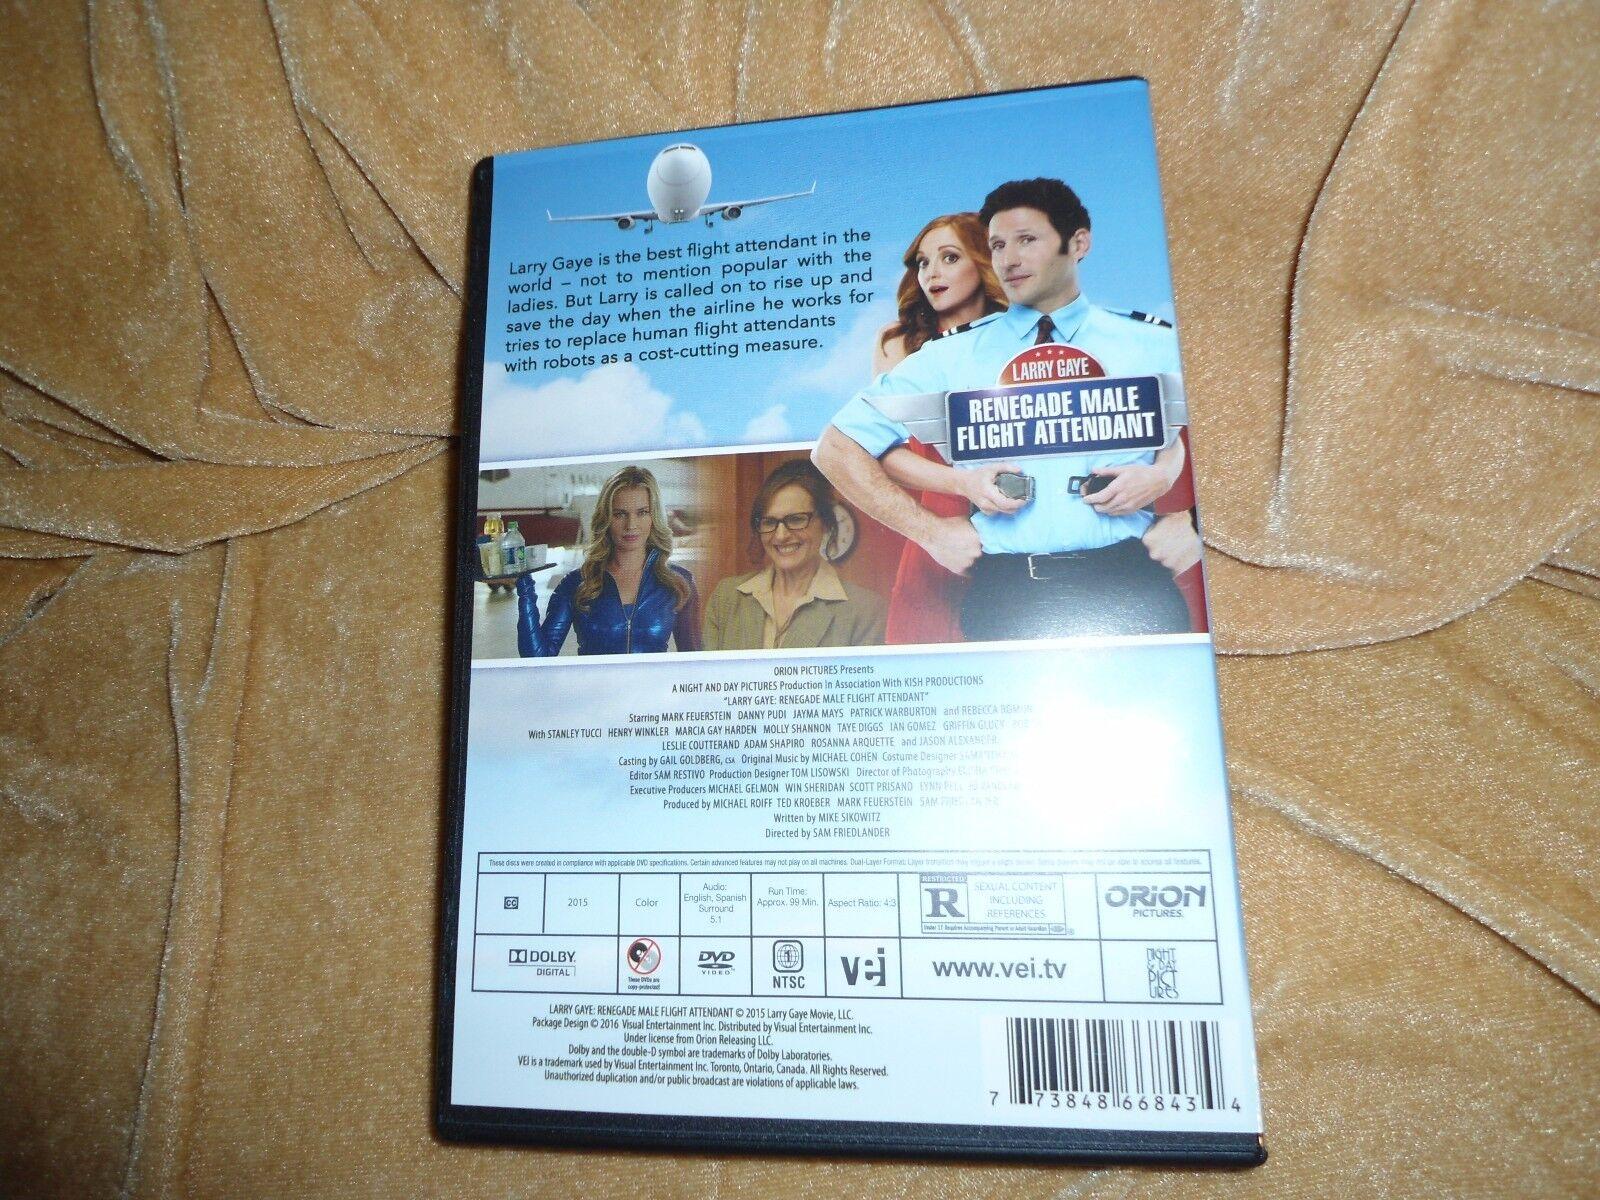 Larry Gaye Renegade Flight Attendant 2015 1 Disc DVD  - $15.99